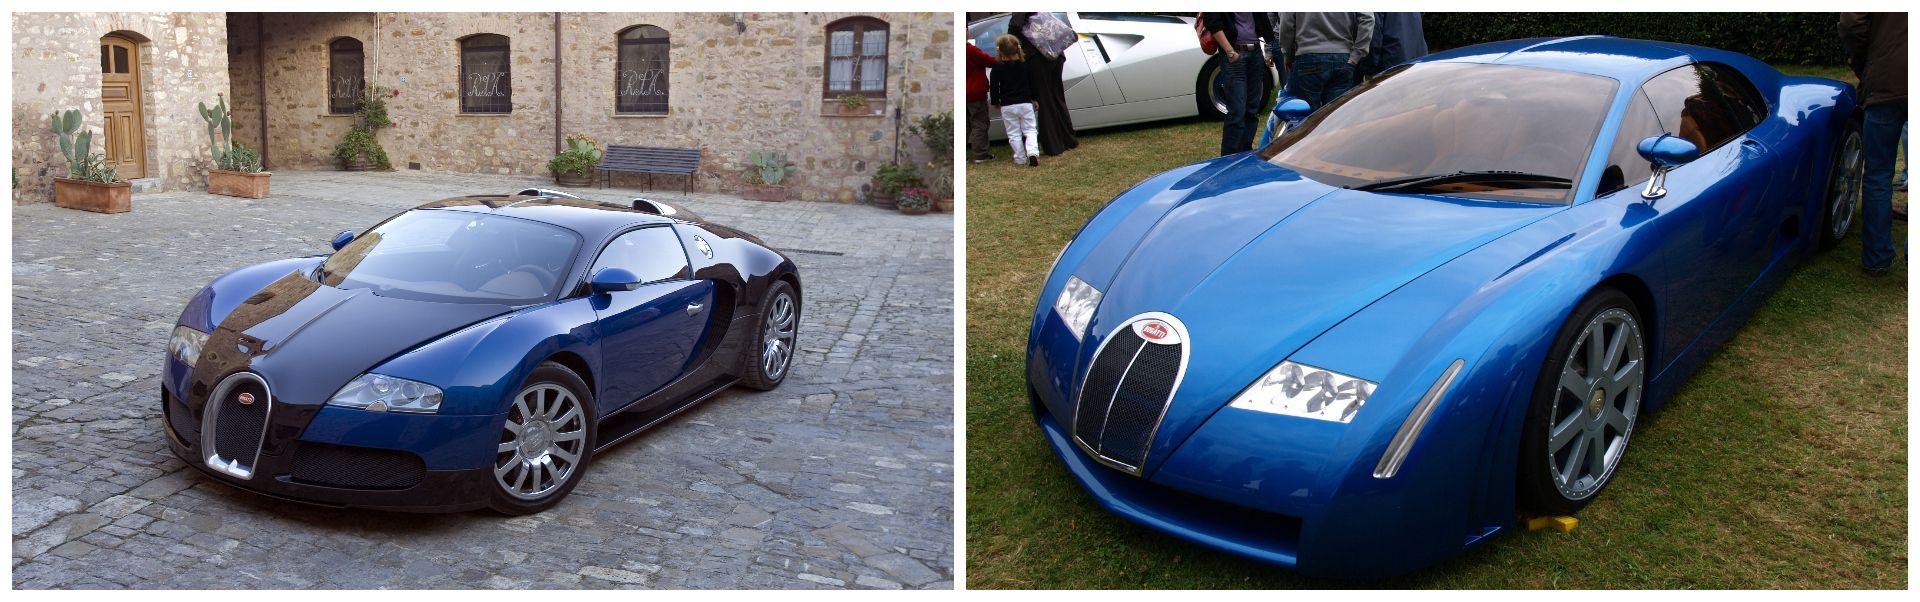 Bugatti Chiron 18/3 Concept / Veyron